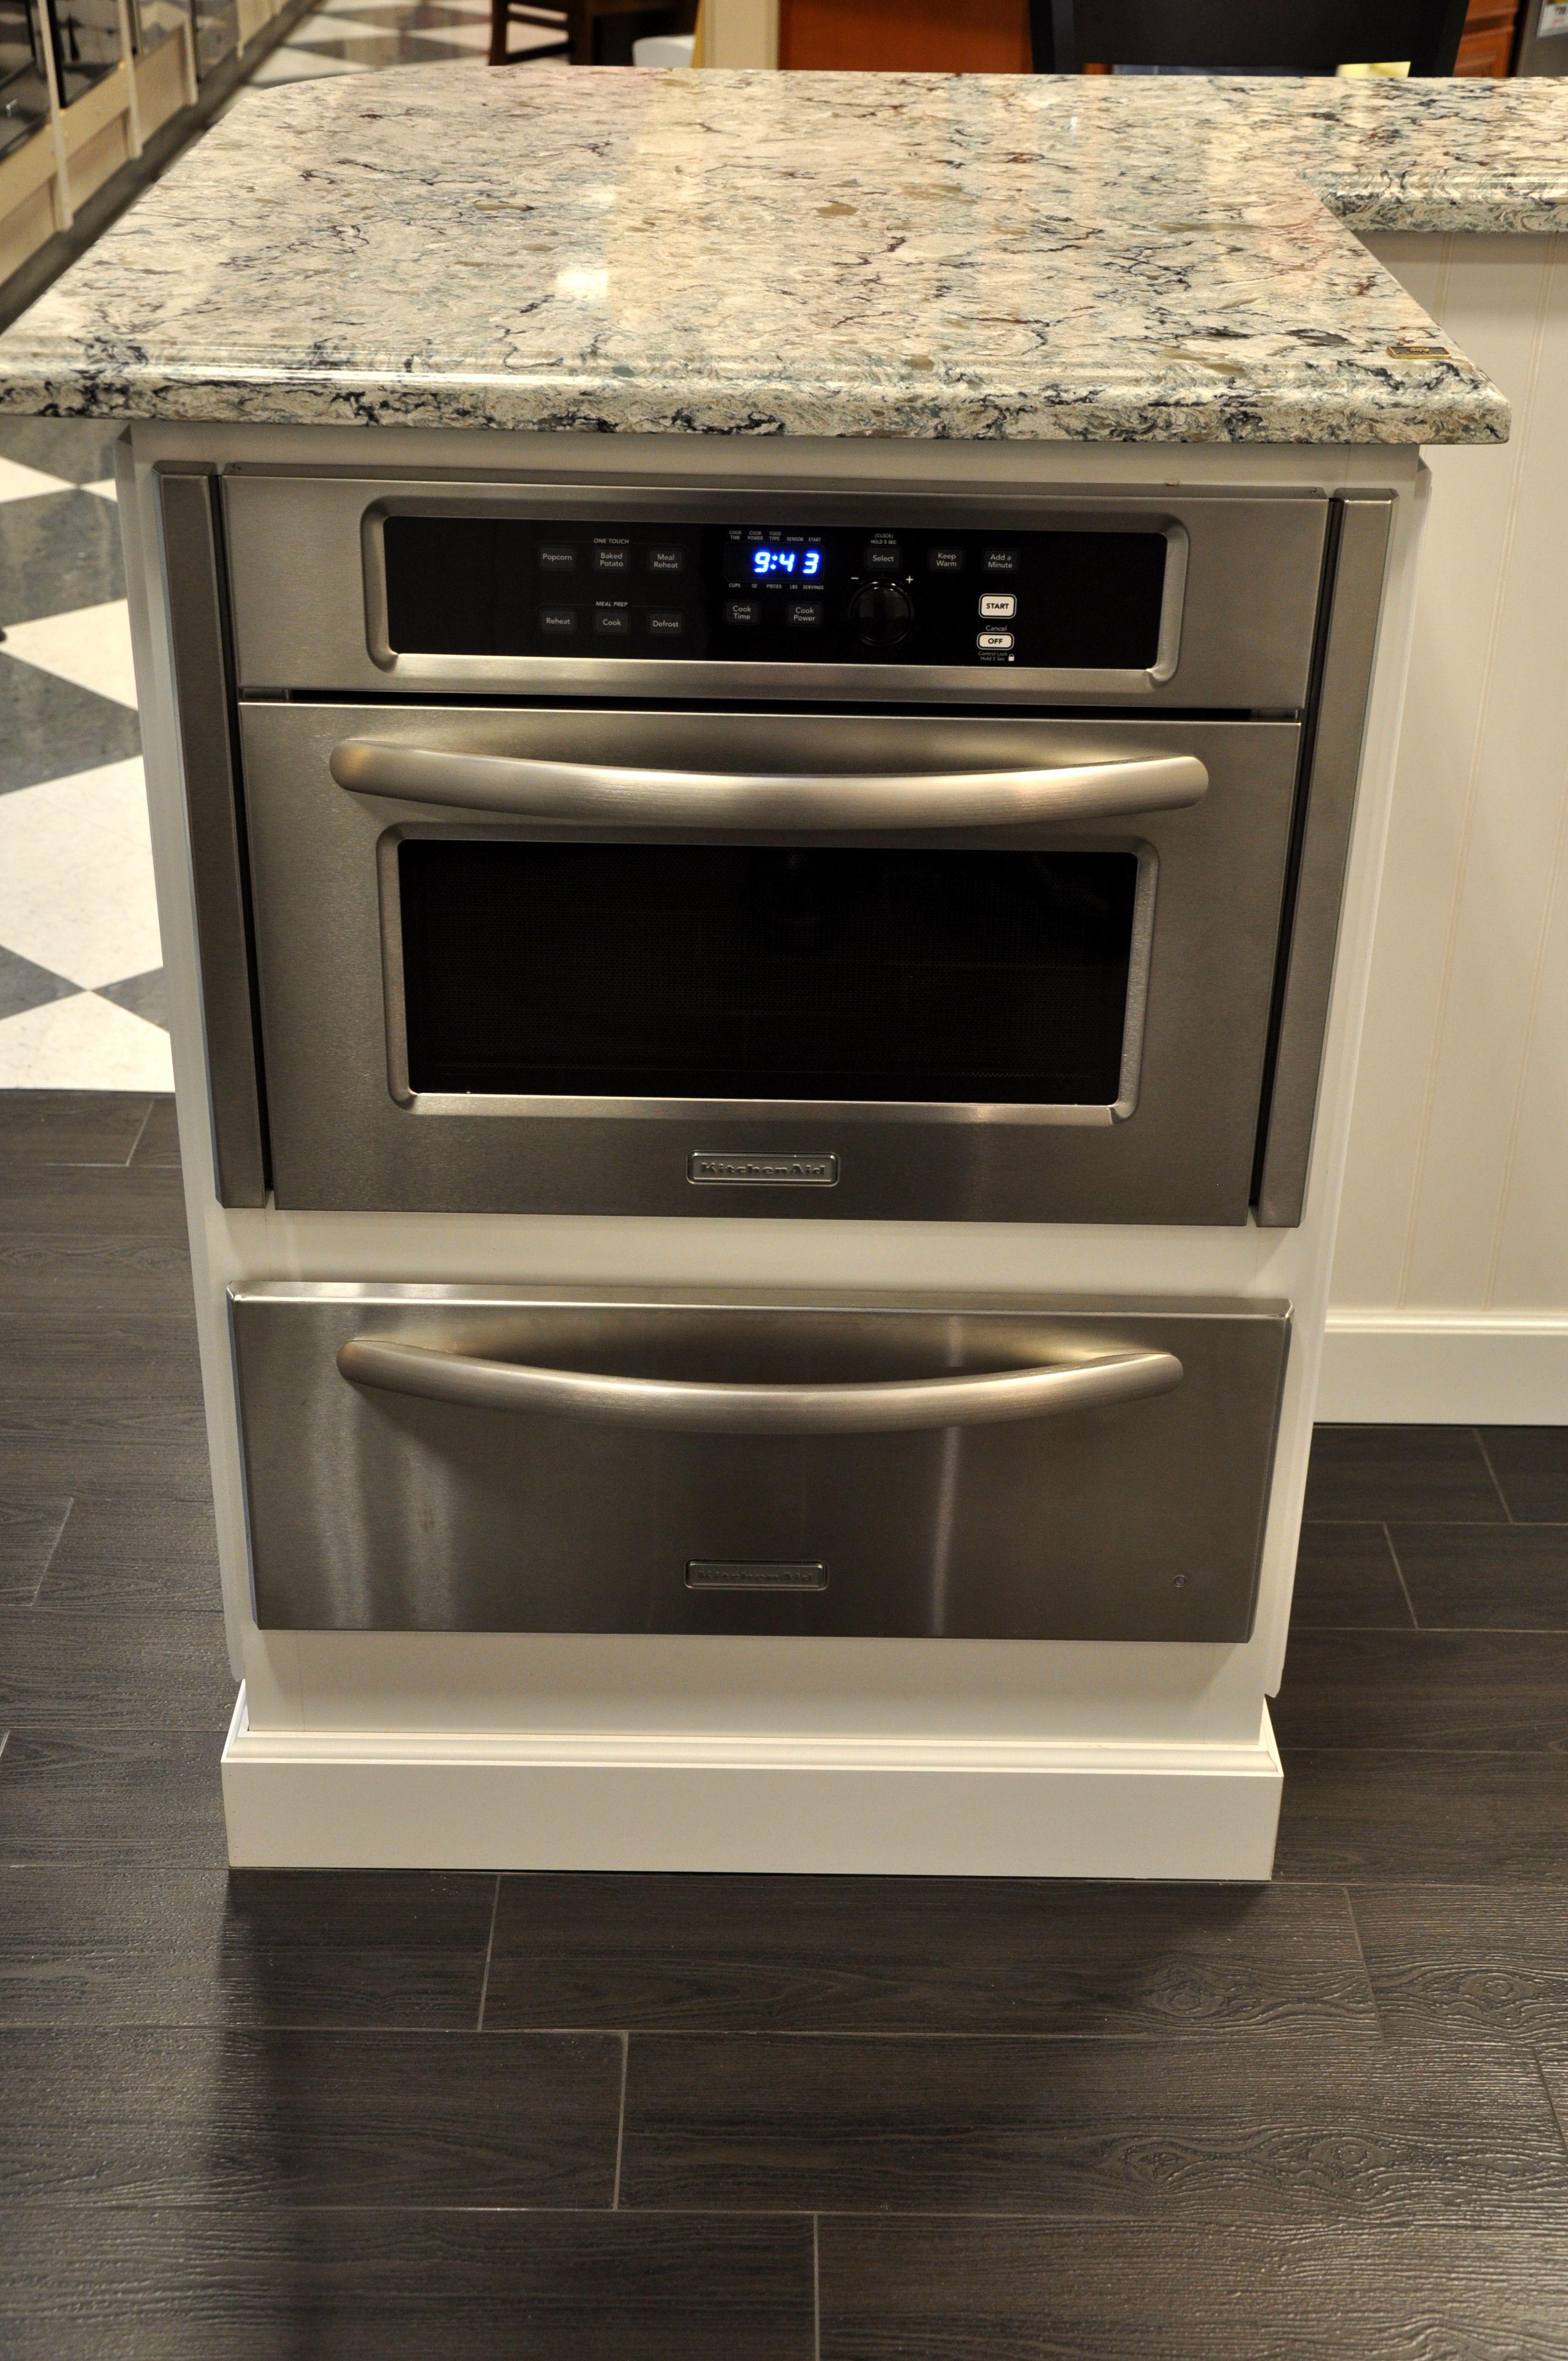 Kitchen Aid Slow Cooker Utensil Organizer Kitchenaid Mircowave With Cook Warming Drawer Below